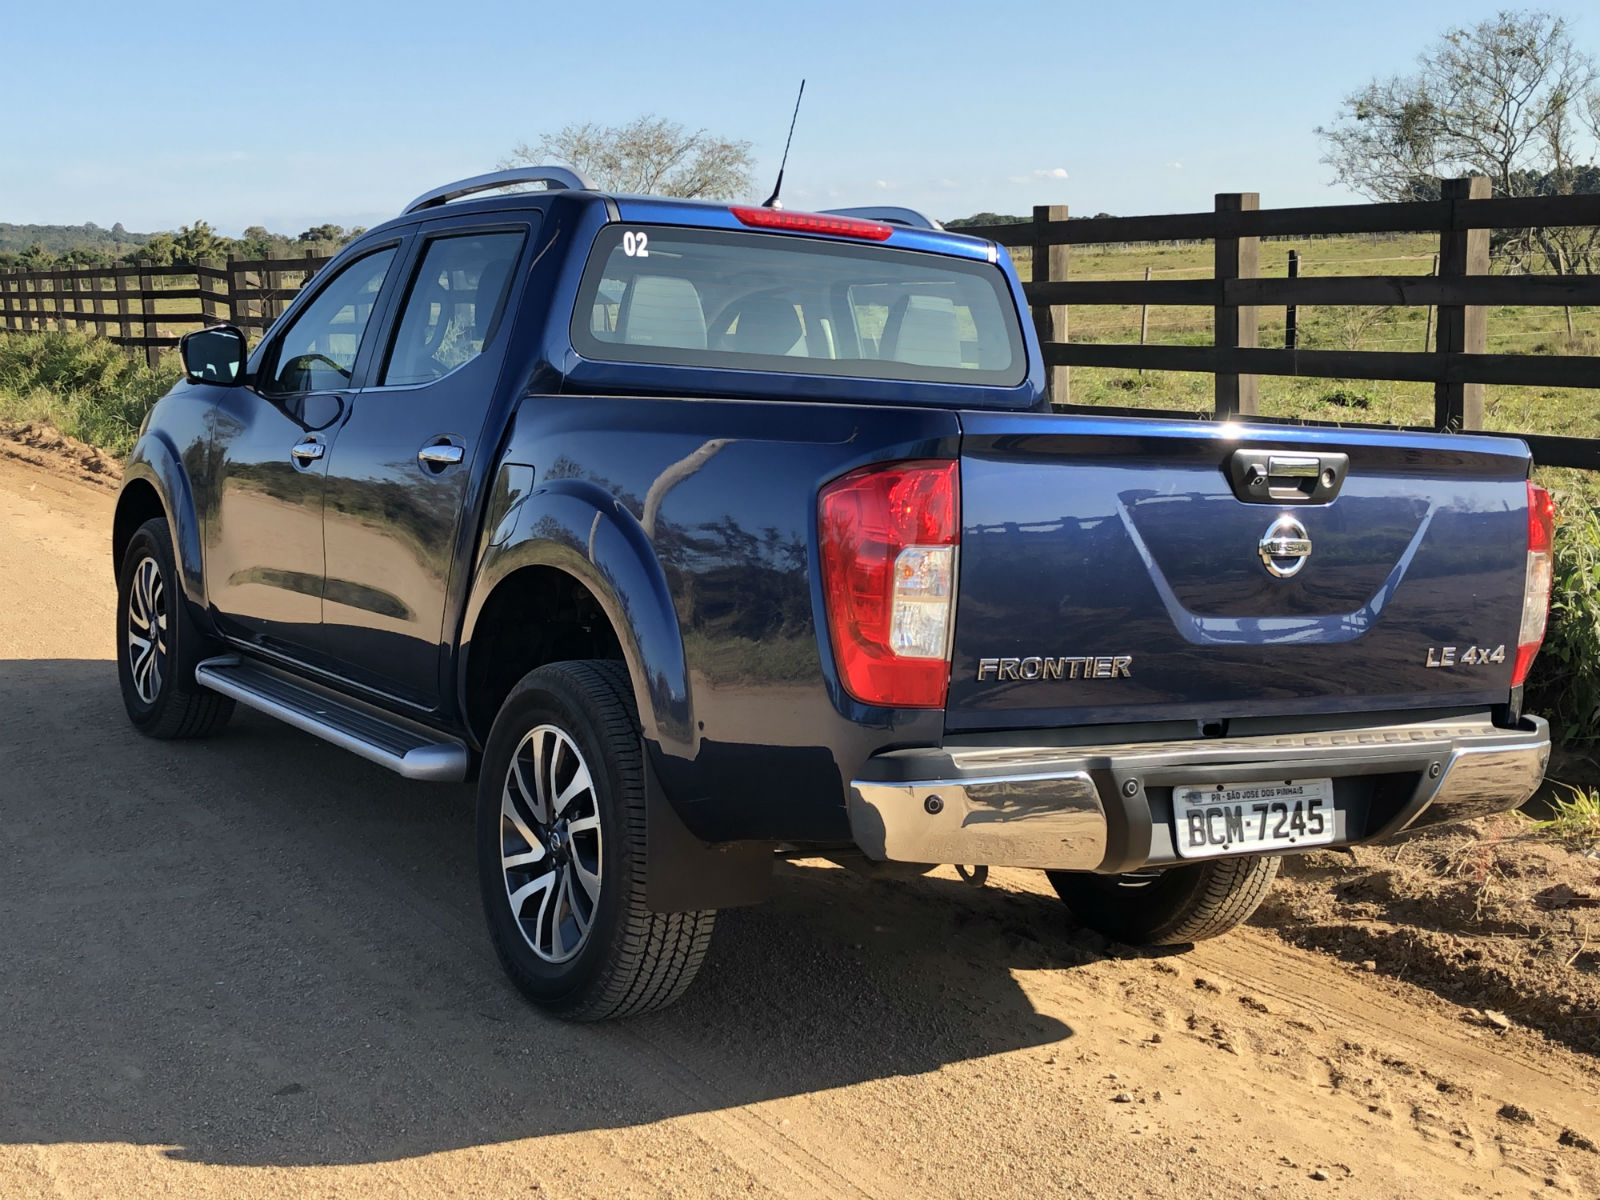 Avaliacao Nissan Frontier Le Bi Turbo Diesel 4x4 Aut 2019 Carpoint News